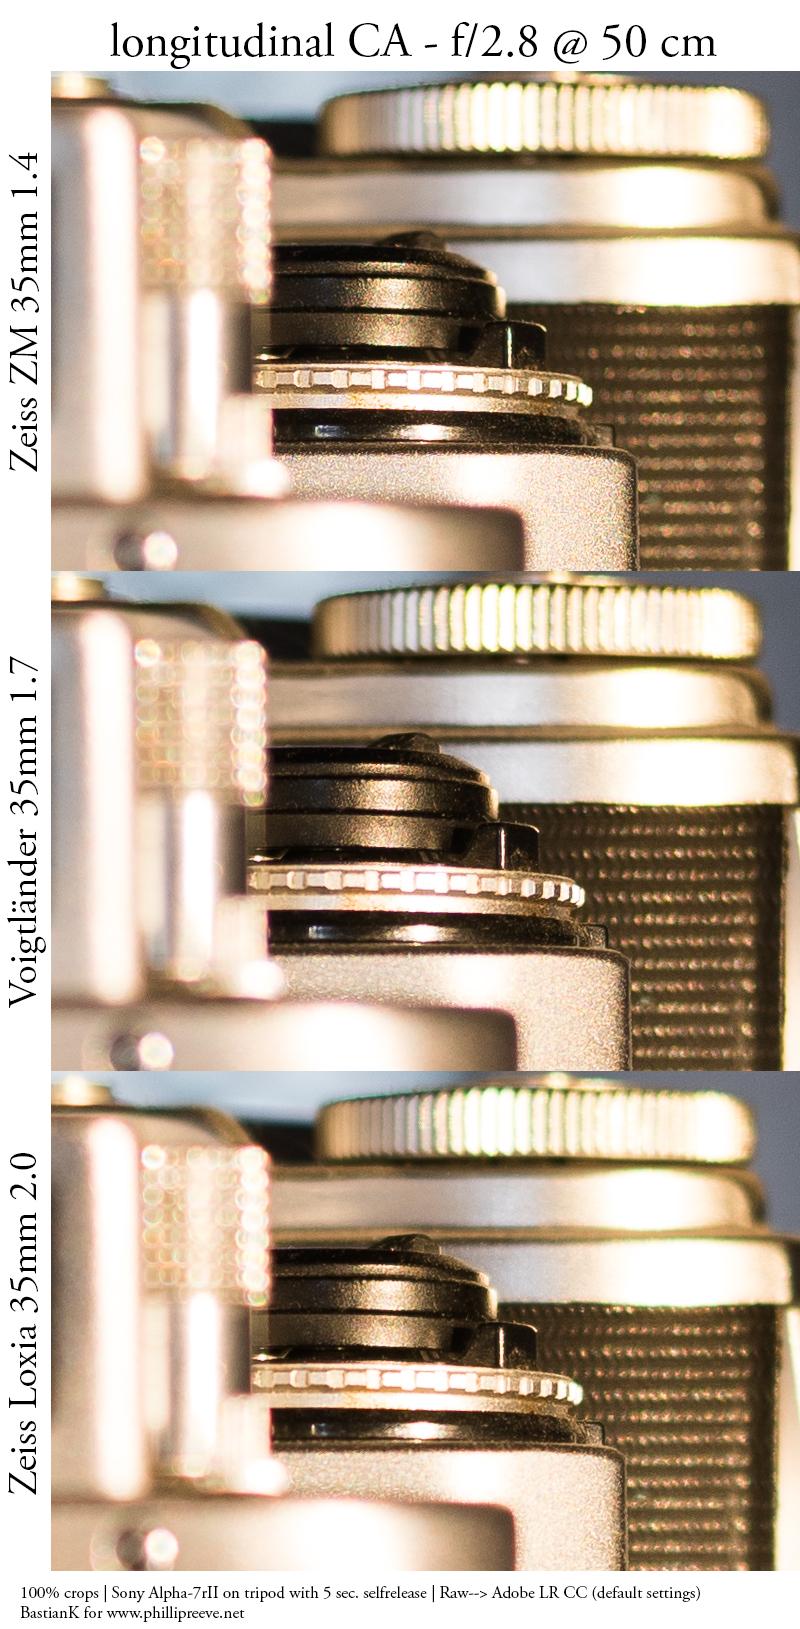 35mm Comparison: Voigtlander VM 1 7, Zeiss Loxia 2 0 and ZM